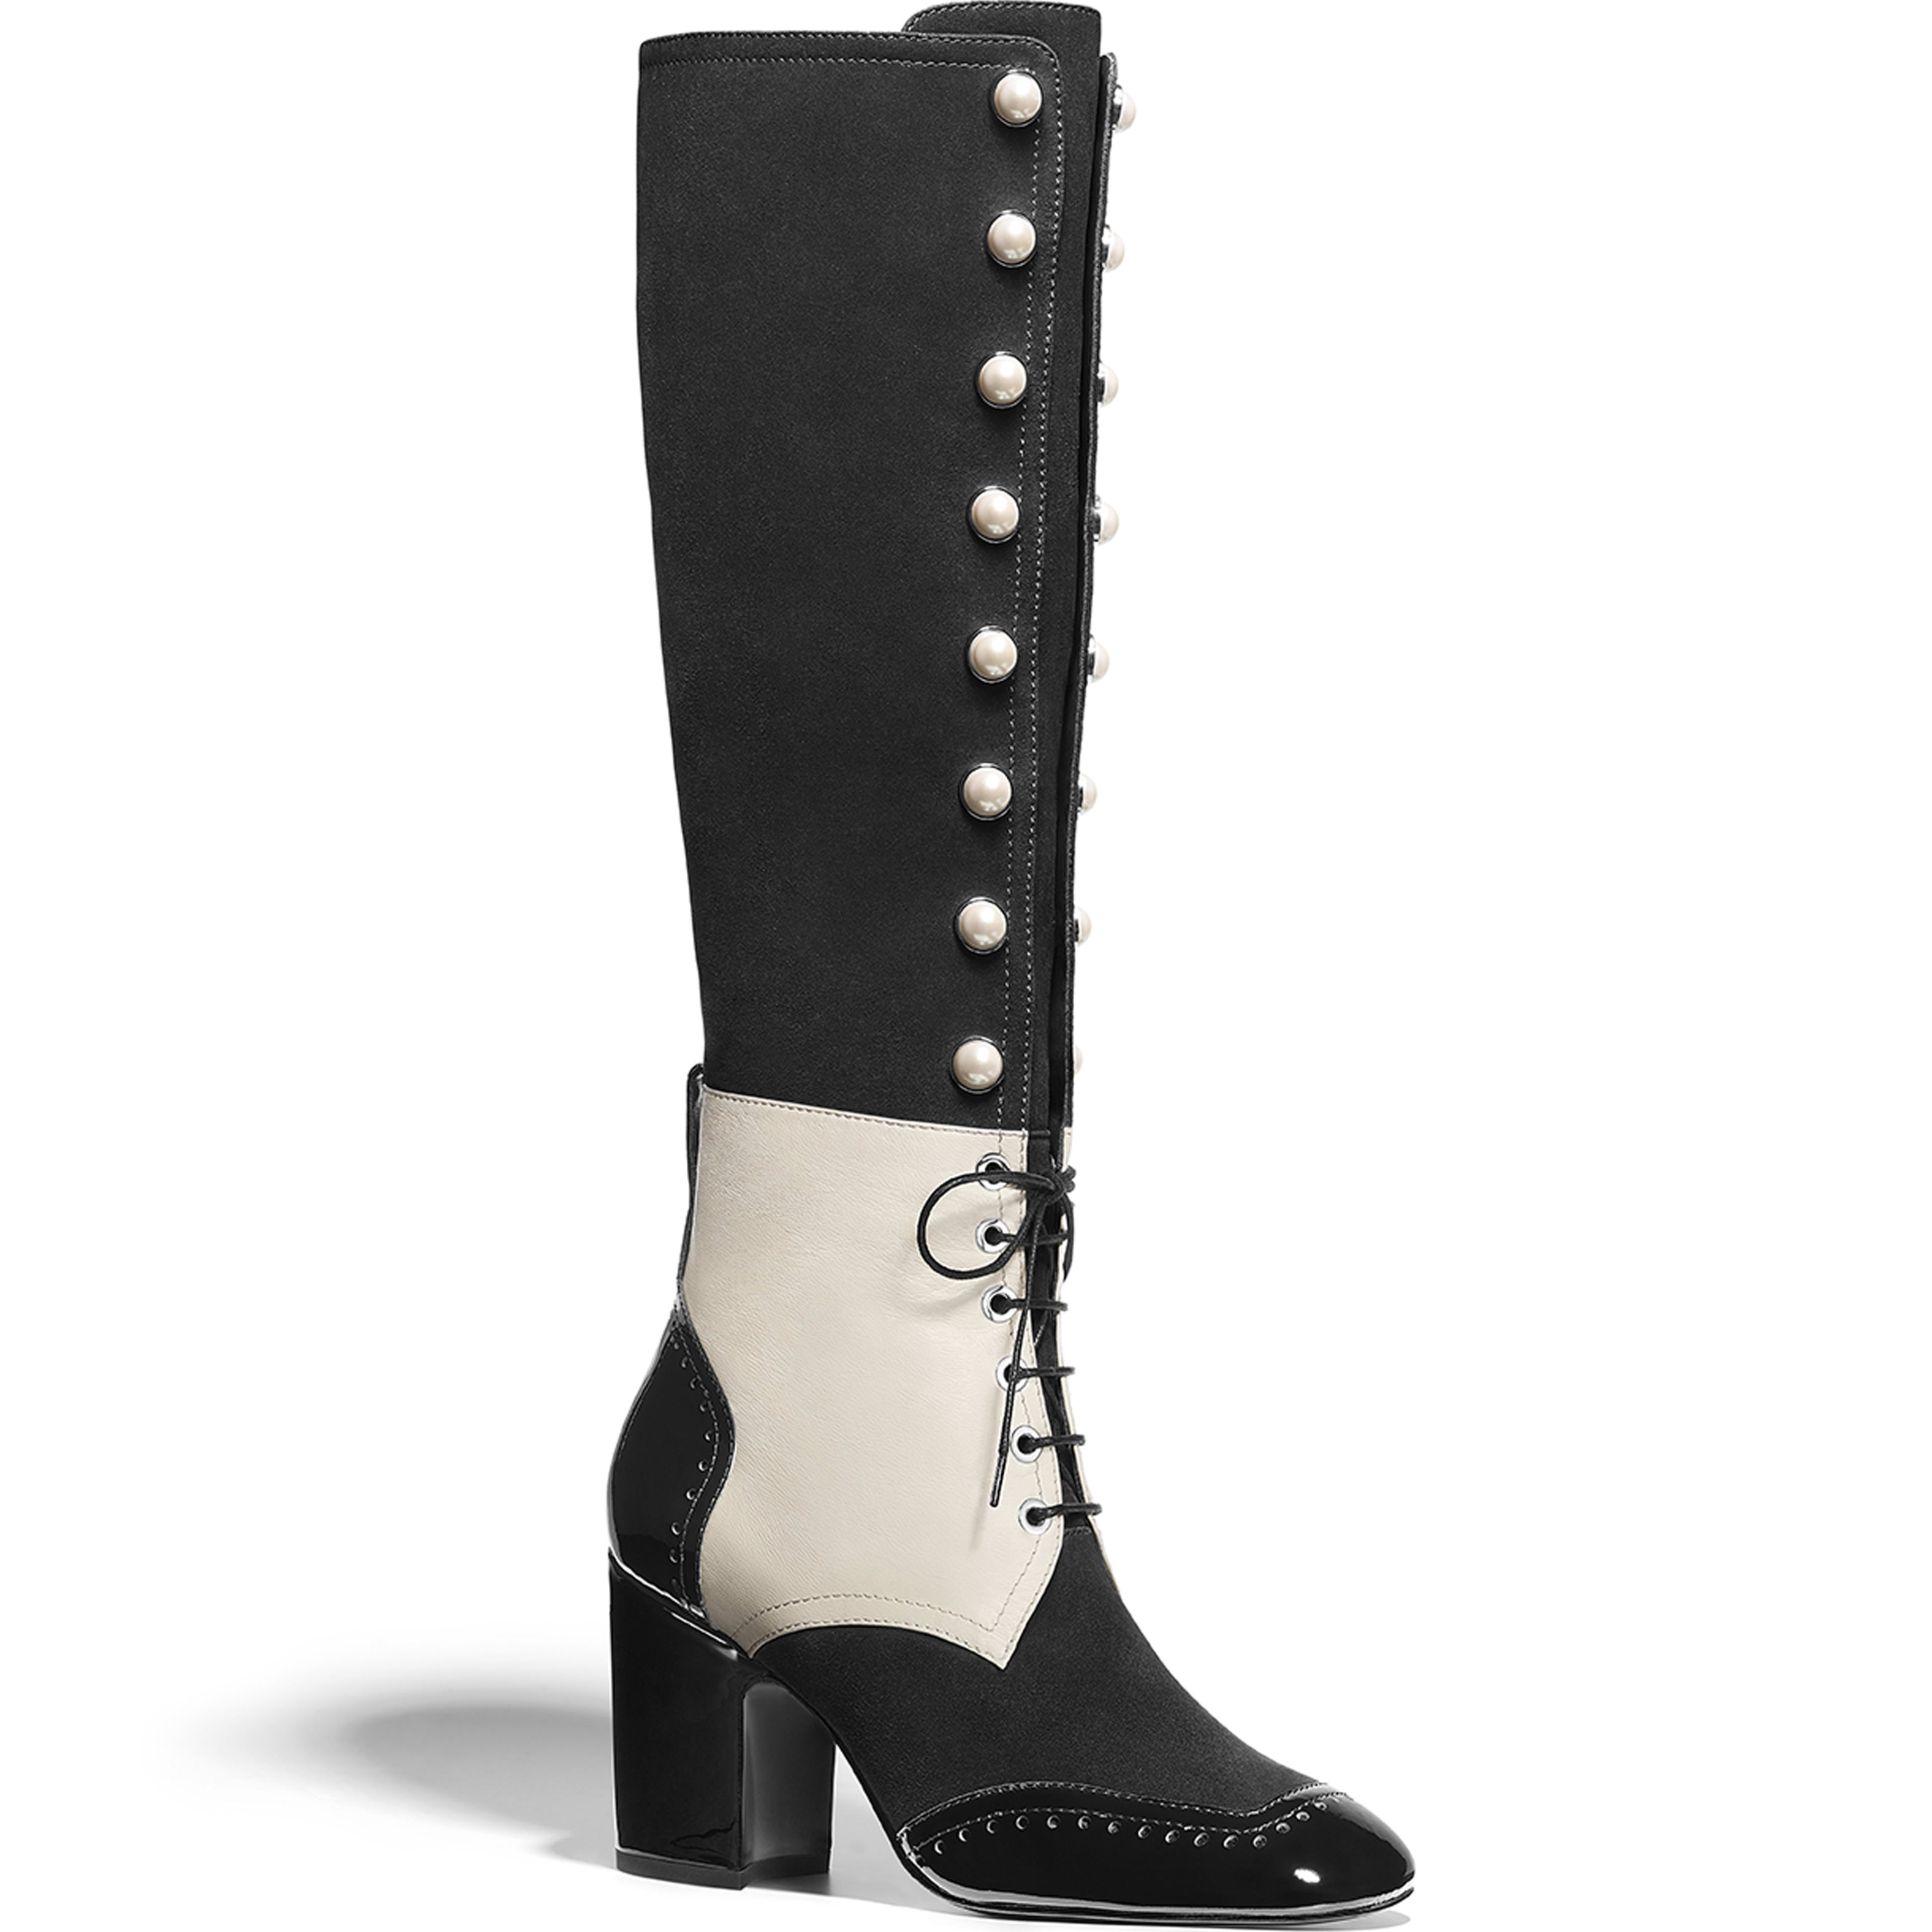 High Boots - Black & Ecru - Suede Goatskin, Lambskin & Patent Calfskin - Default view - see full sized version